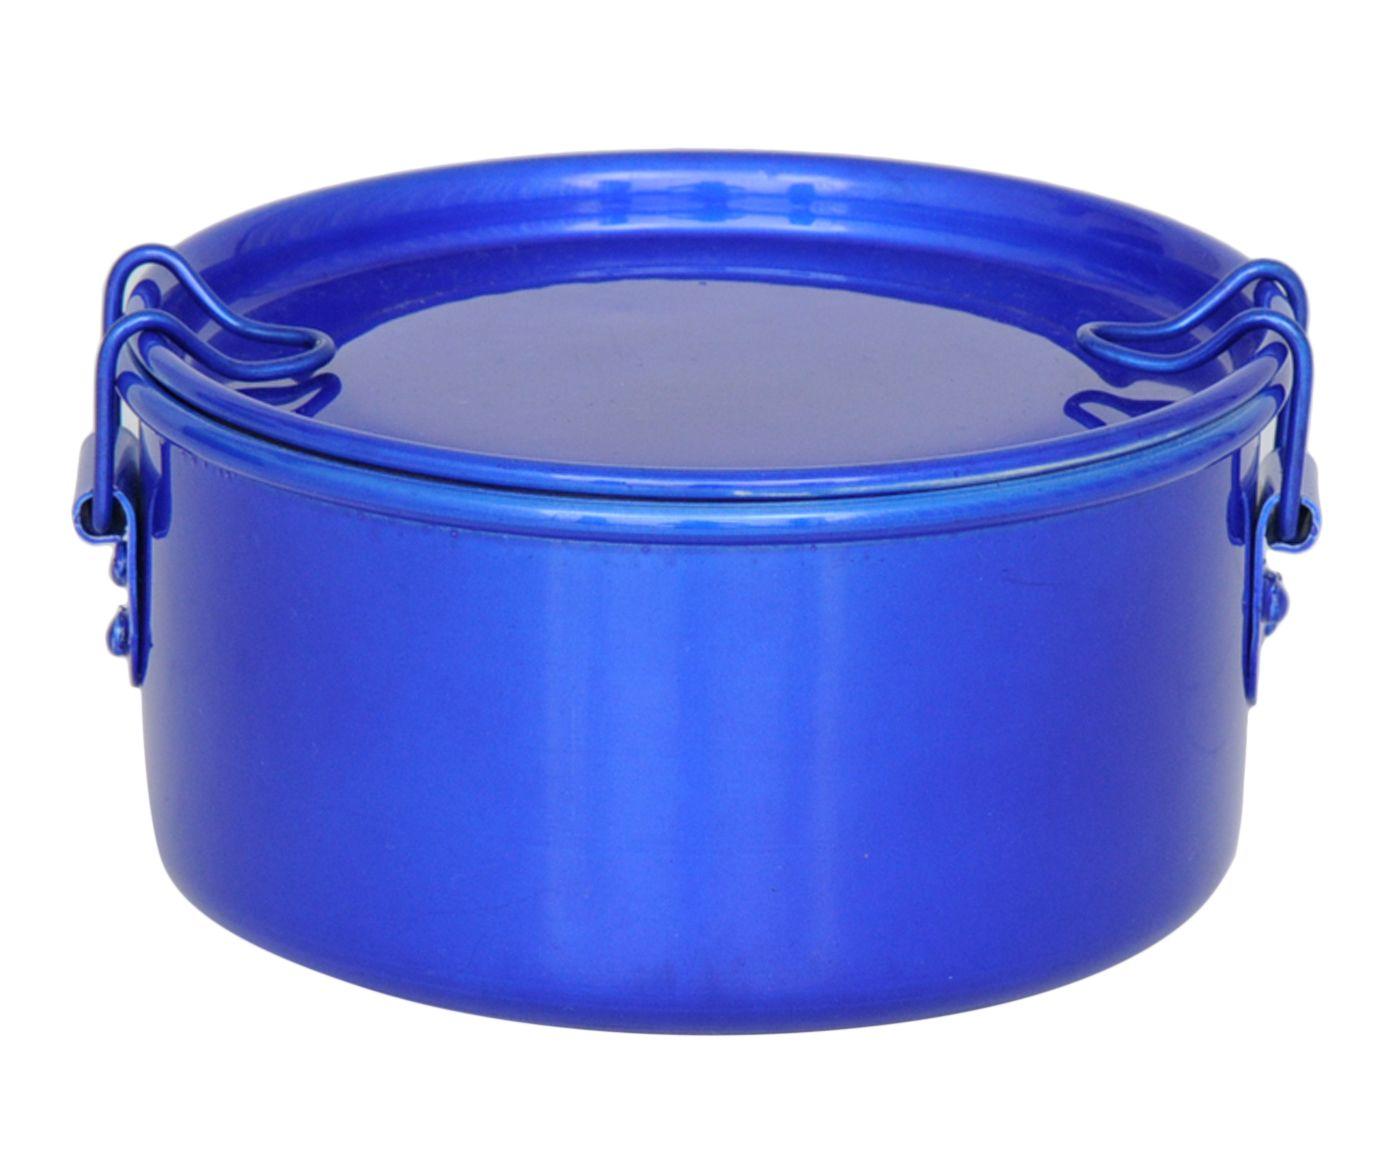 Marmitinha Katte Azul Real - 500ml | Westwing.com.br